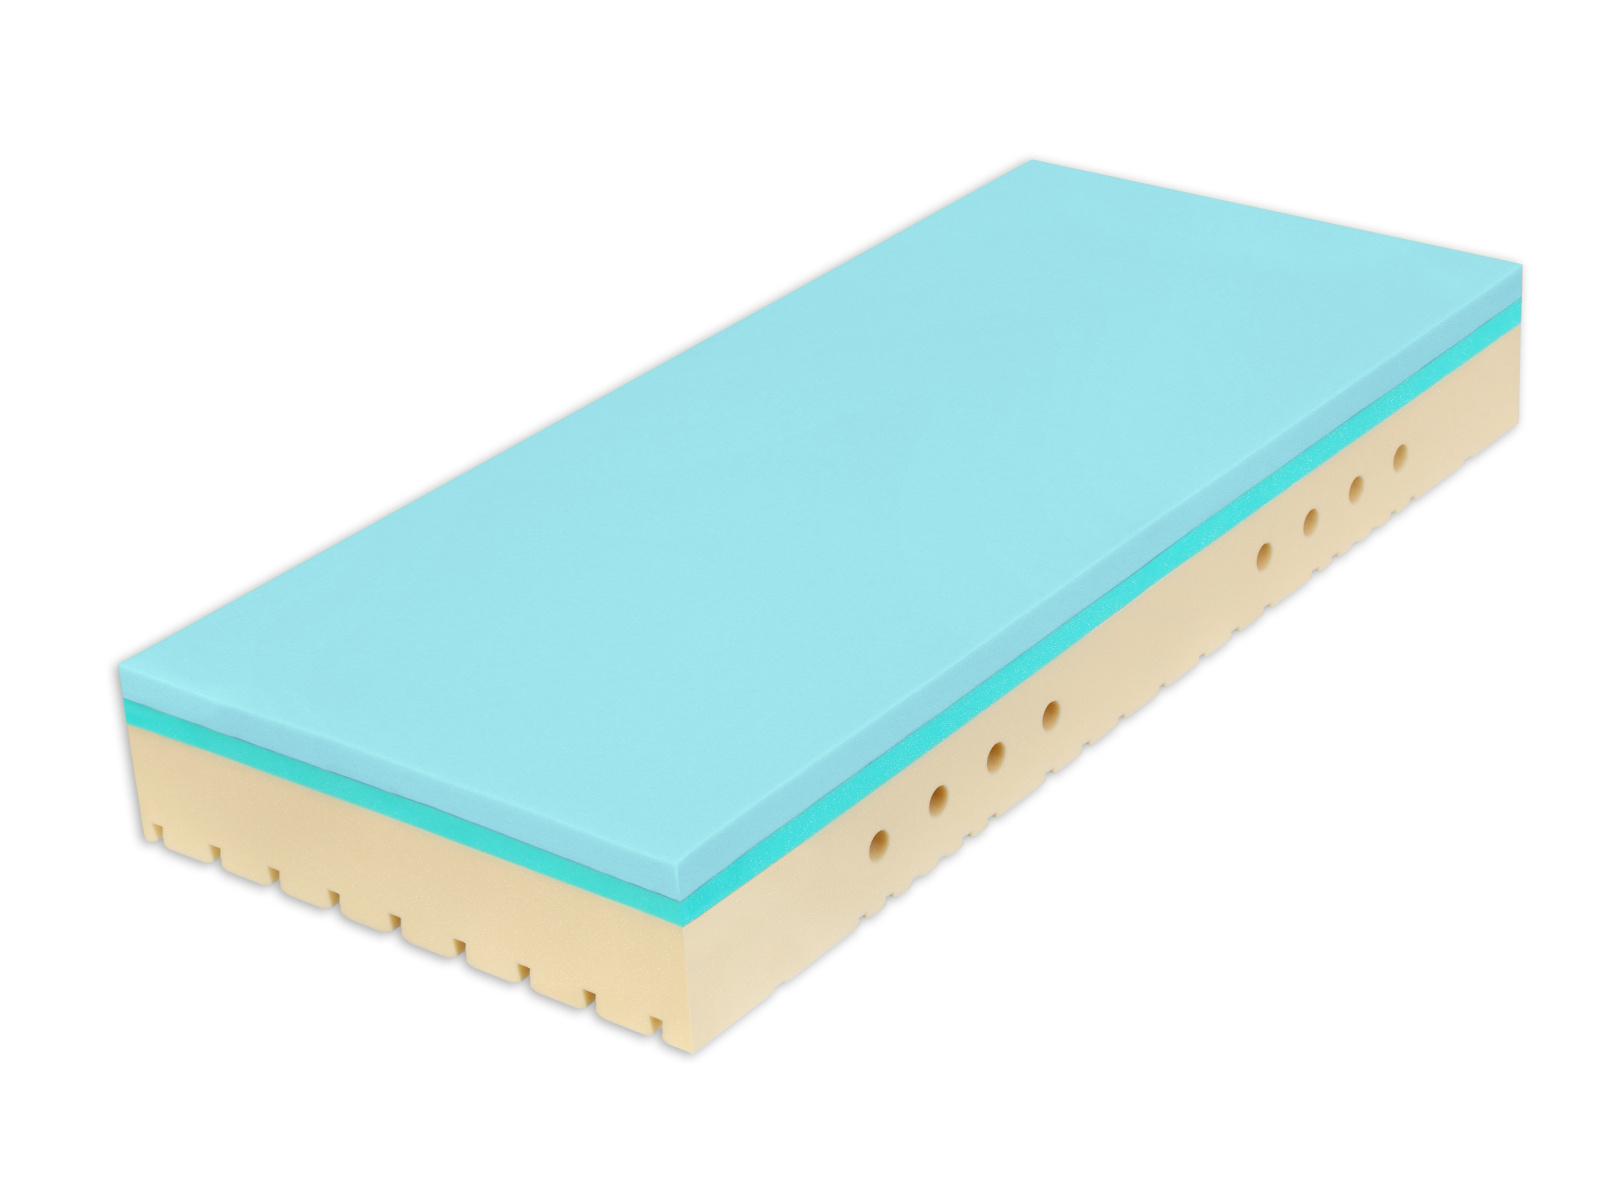 Matrace SUPER FOX BLUE Classic 80x200x22 cm, 1+1 ZDARMA